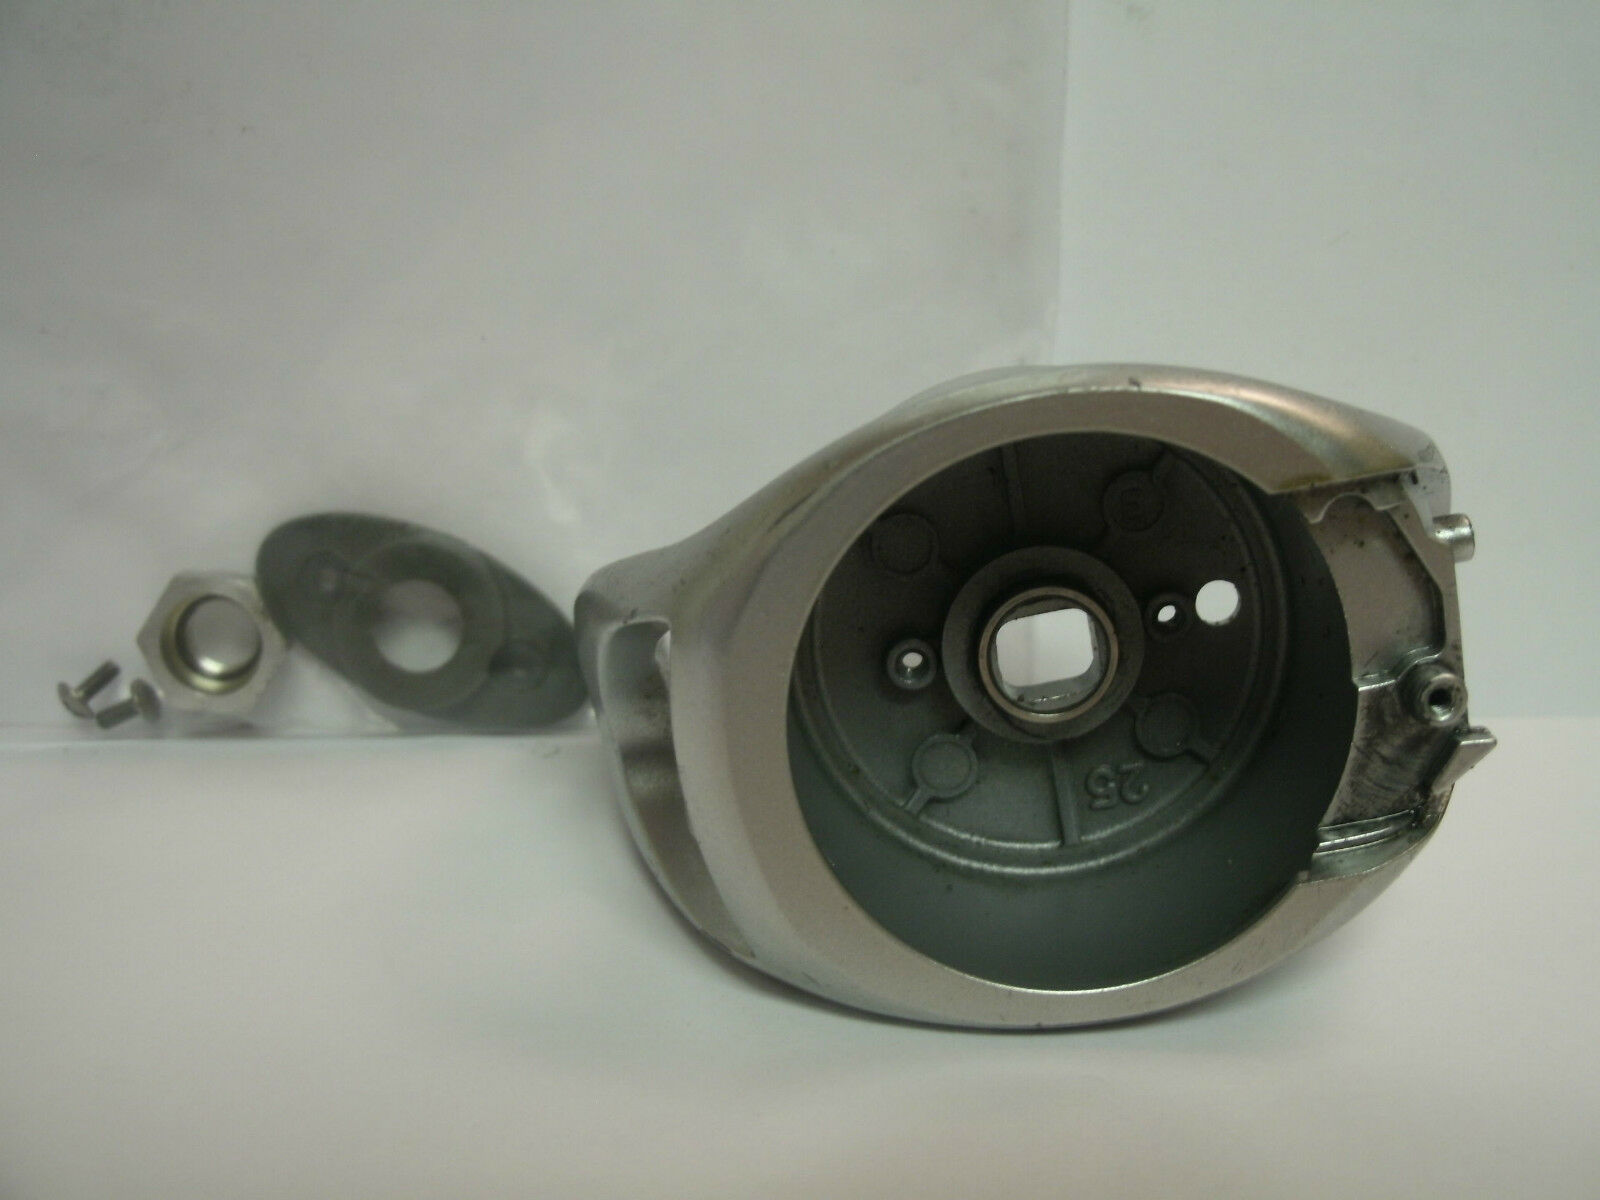 USED SHIMANO SPINNING REEL PART - Stella 2500F - redor